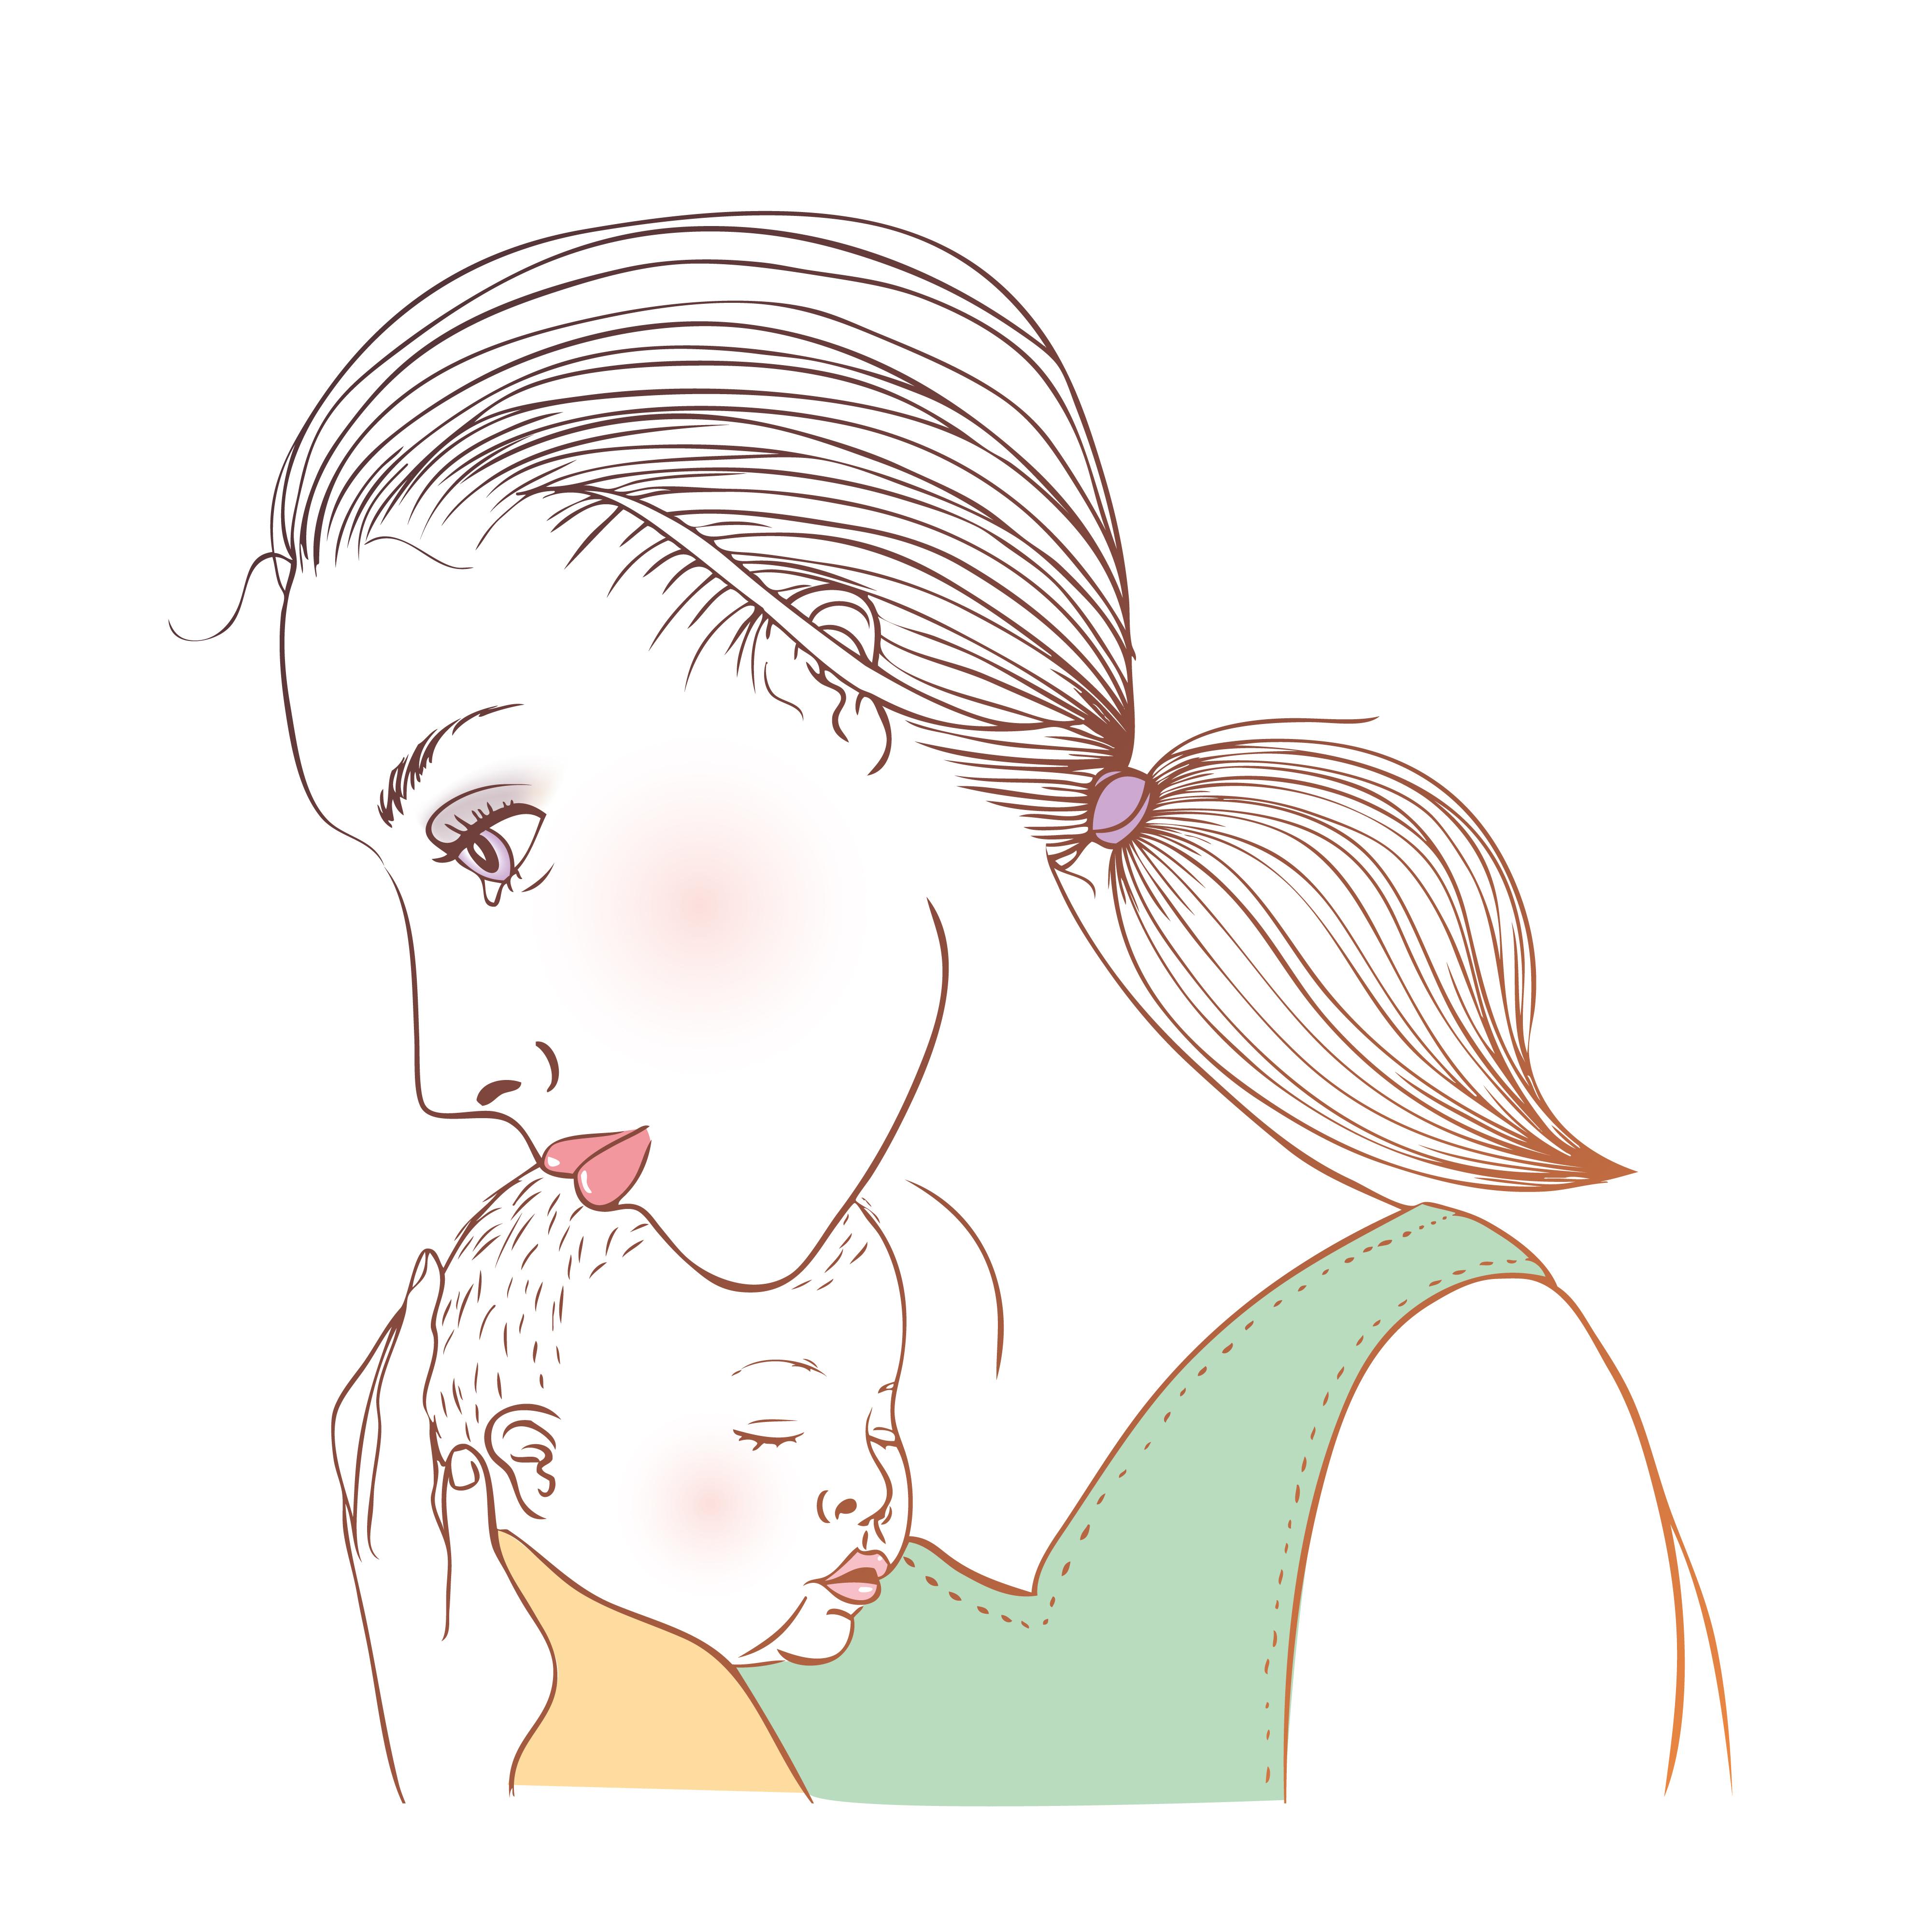 schizophrenia psychosis and lifespan development Check out our top free essays on lifespan development to help you write o examine the various classifications of schizophrenia and psychosis, and lifespan.